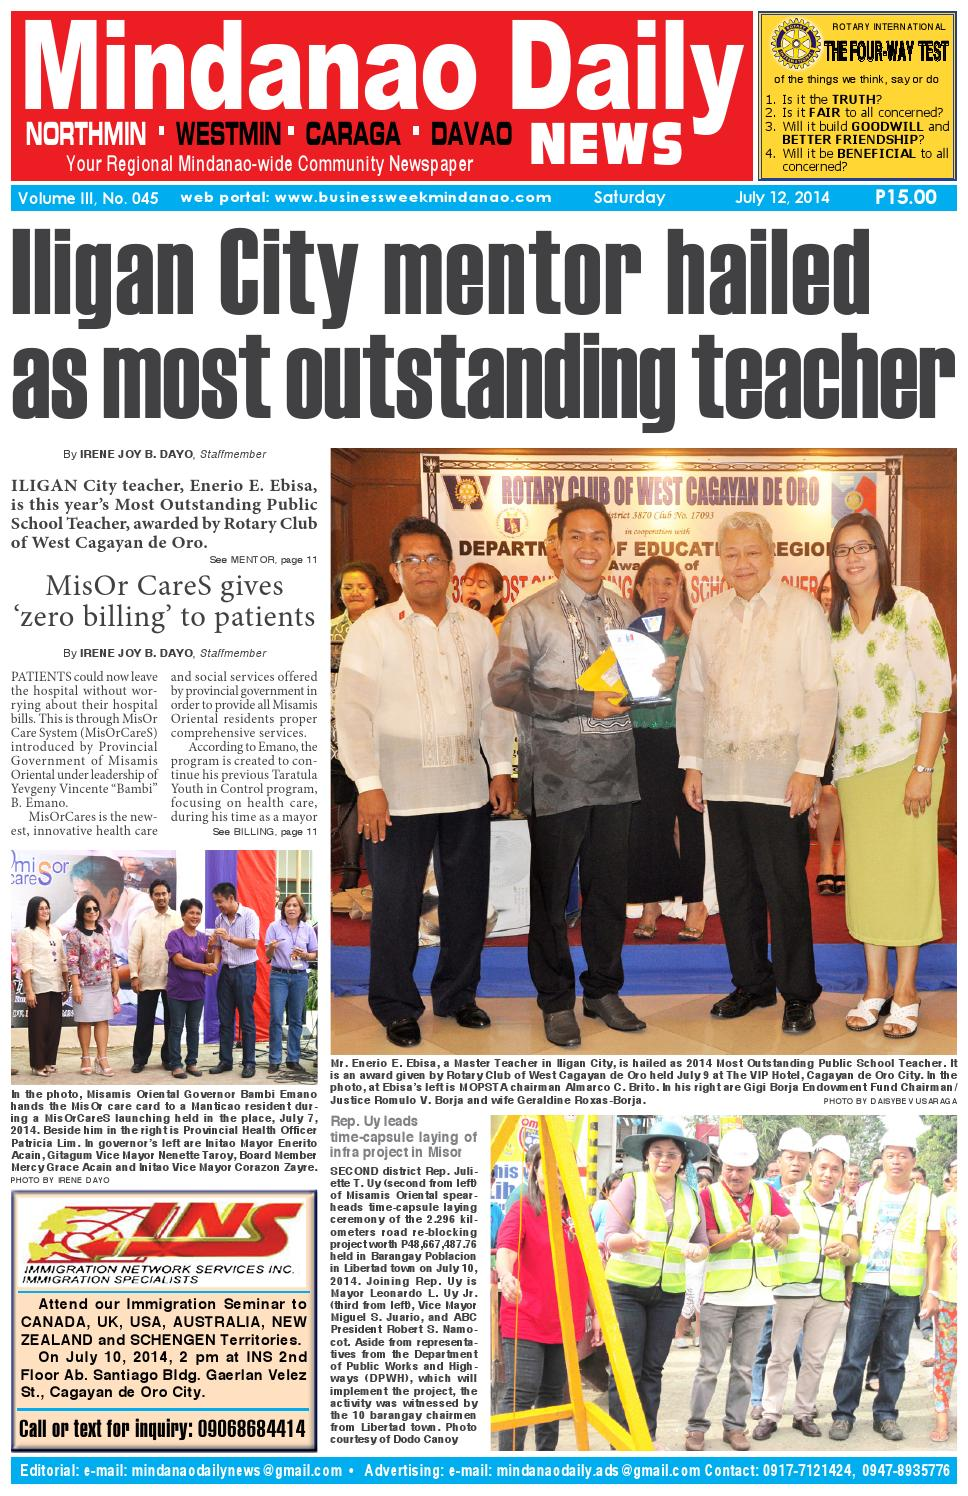 Mindanao Daily News (July 12, 2014) by Mindanao Daily News - issuu